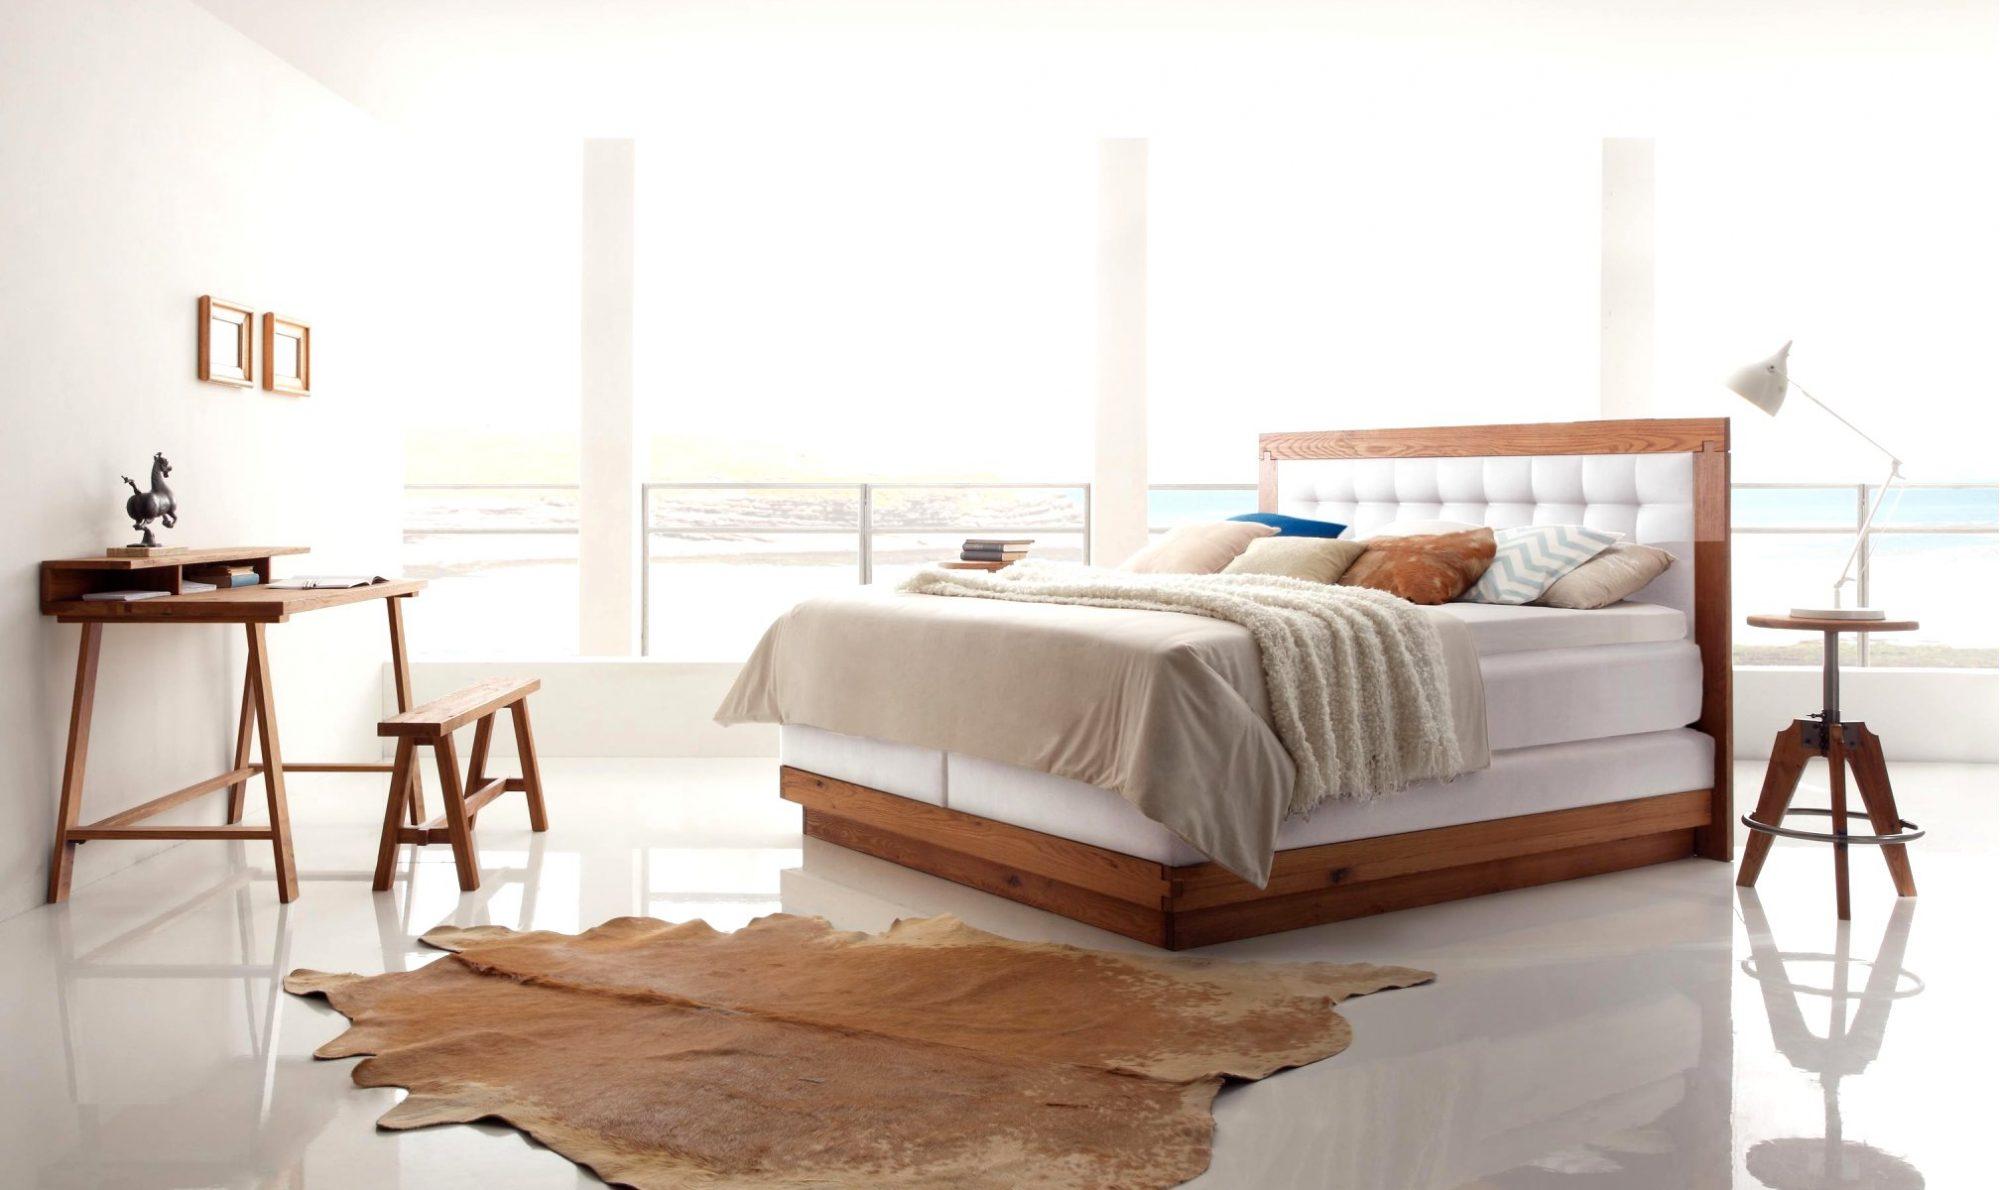 boxspringbetten das zertifizierte fachgesch ft in neuburg mit 250 m fl che. Black Bedroom Furniture Sets. Home Design Ideas